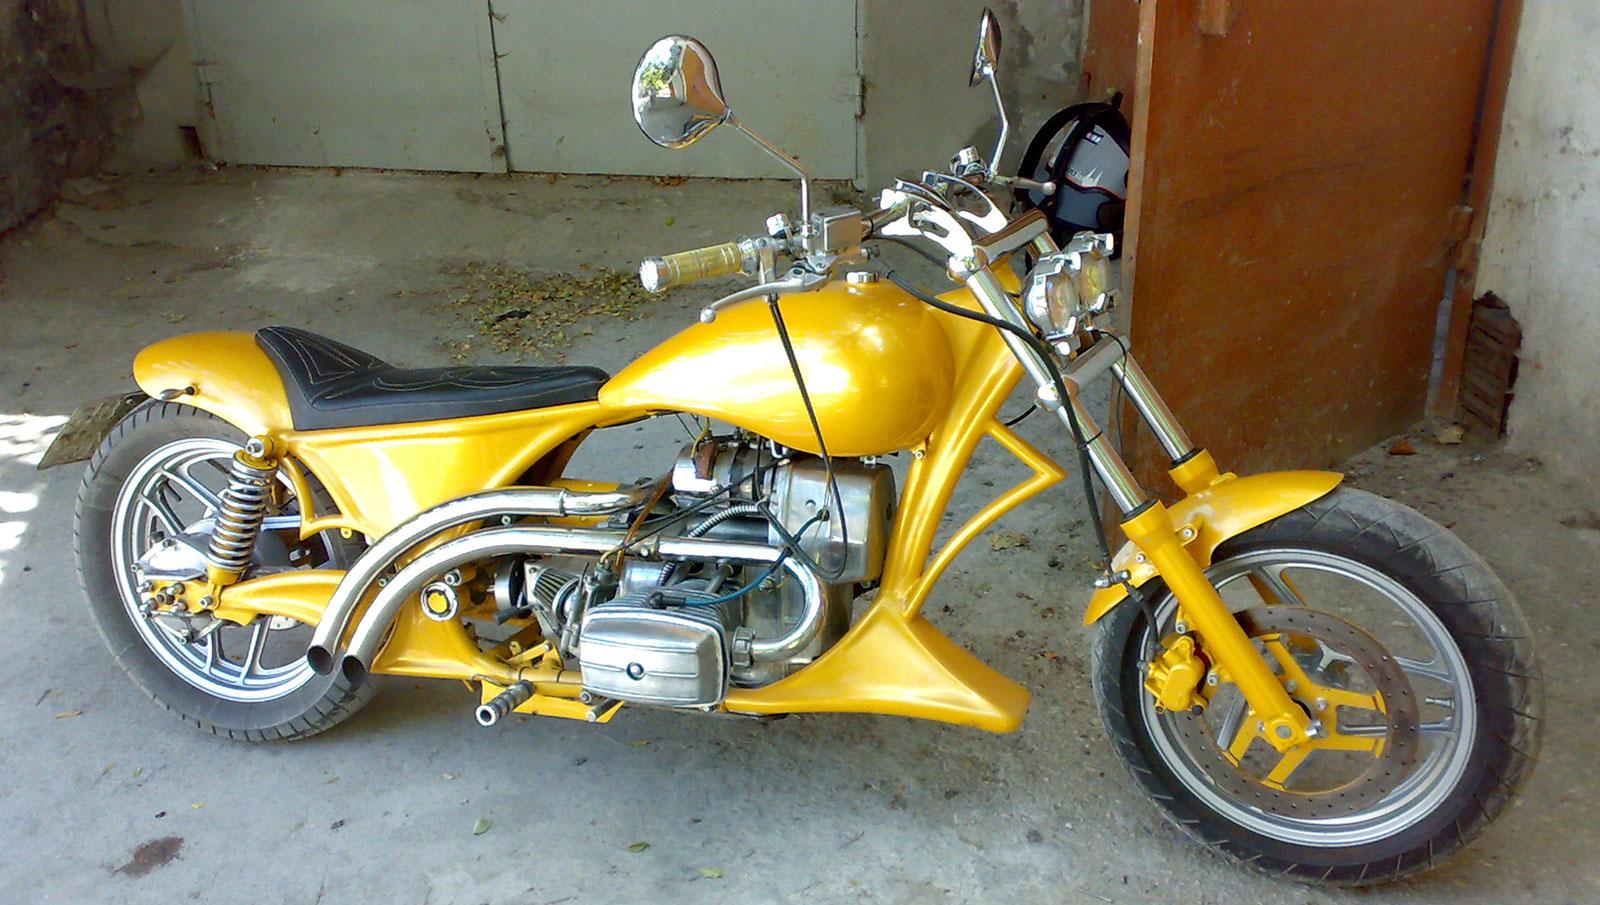 Moto032: Тюнинг мотоцикла минск 84